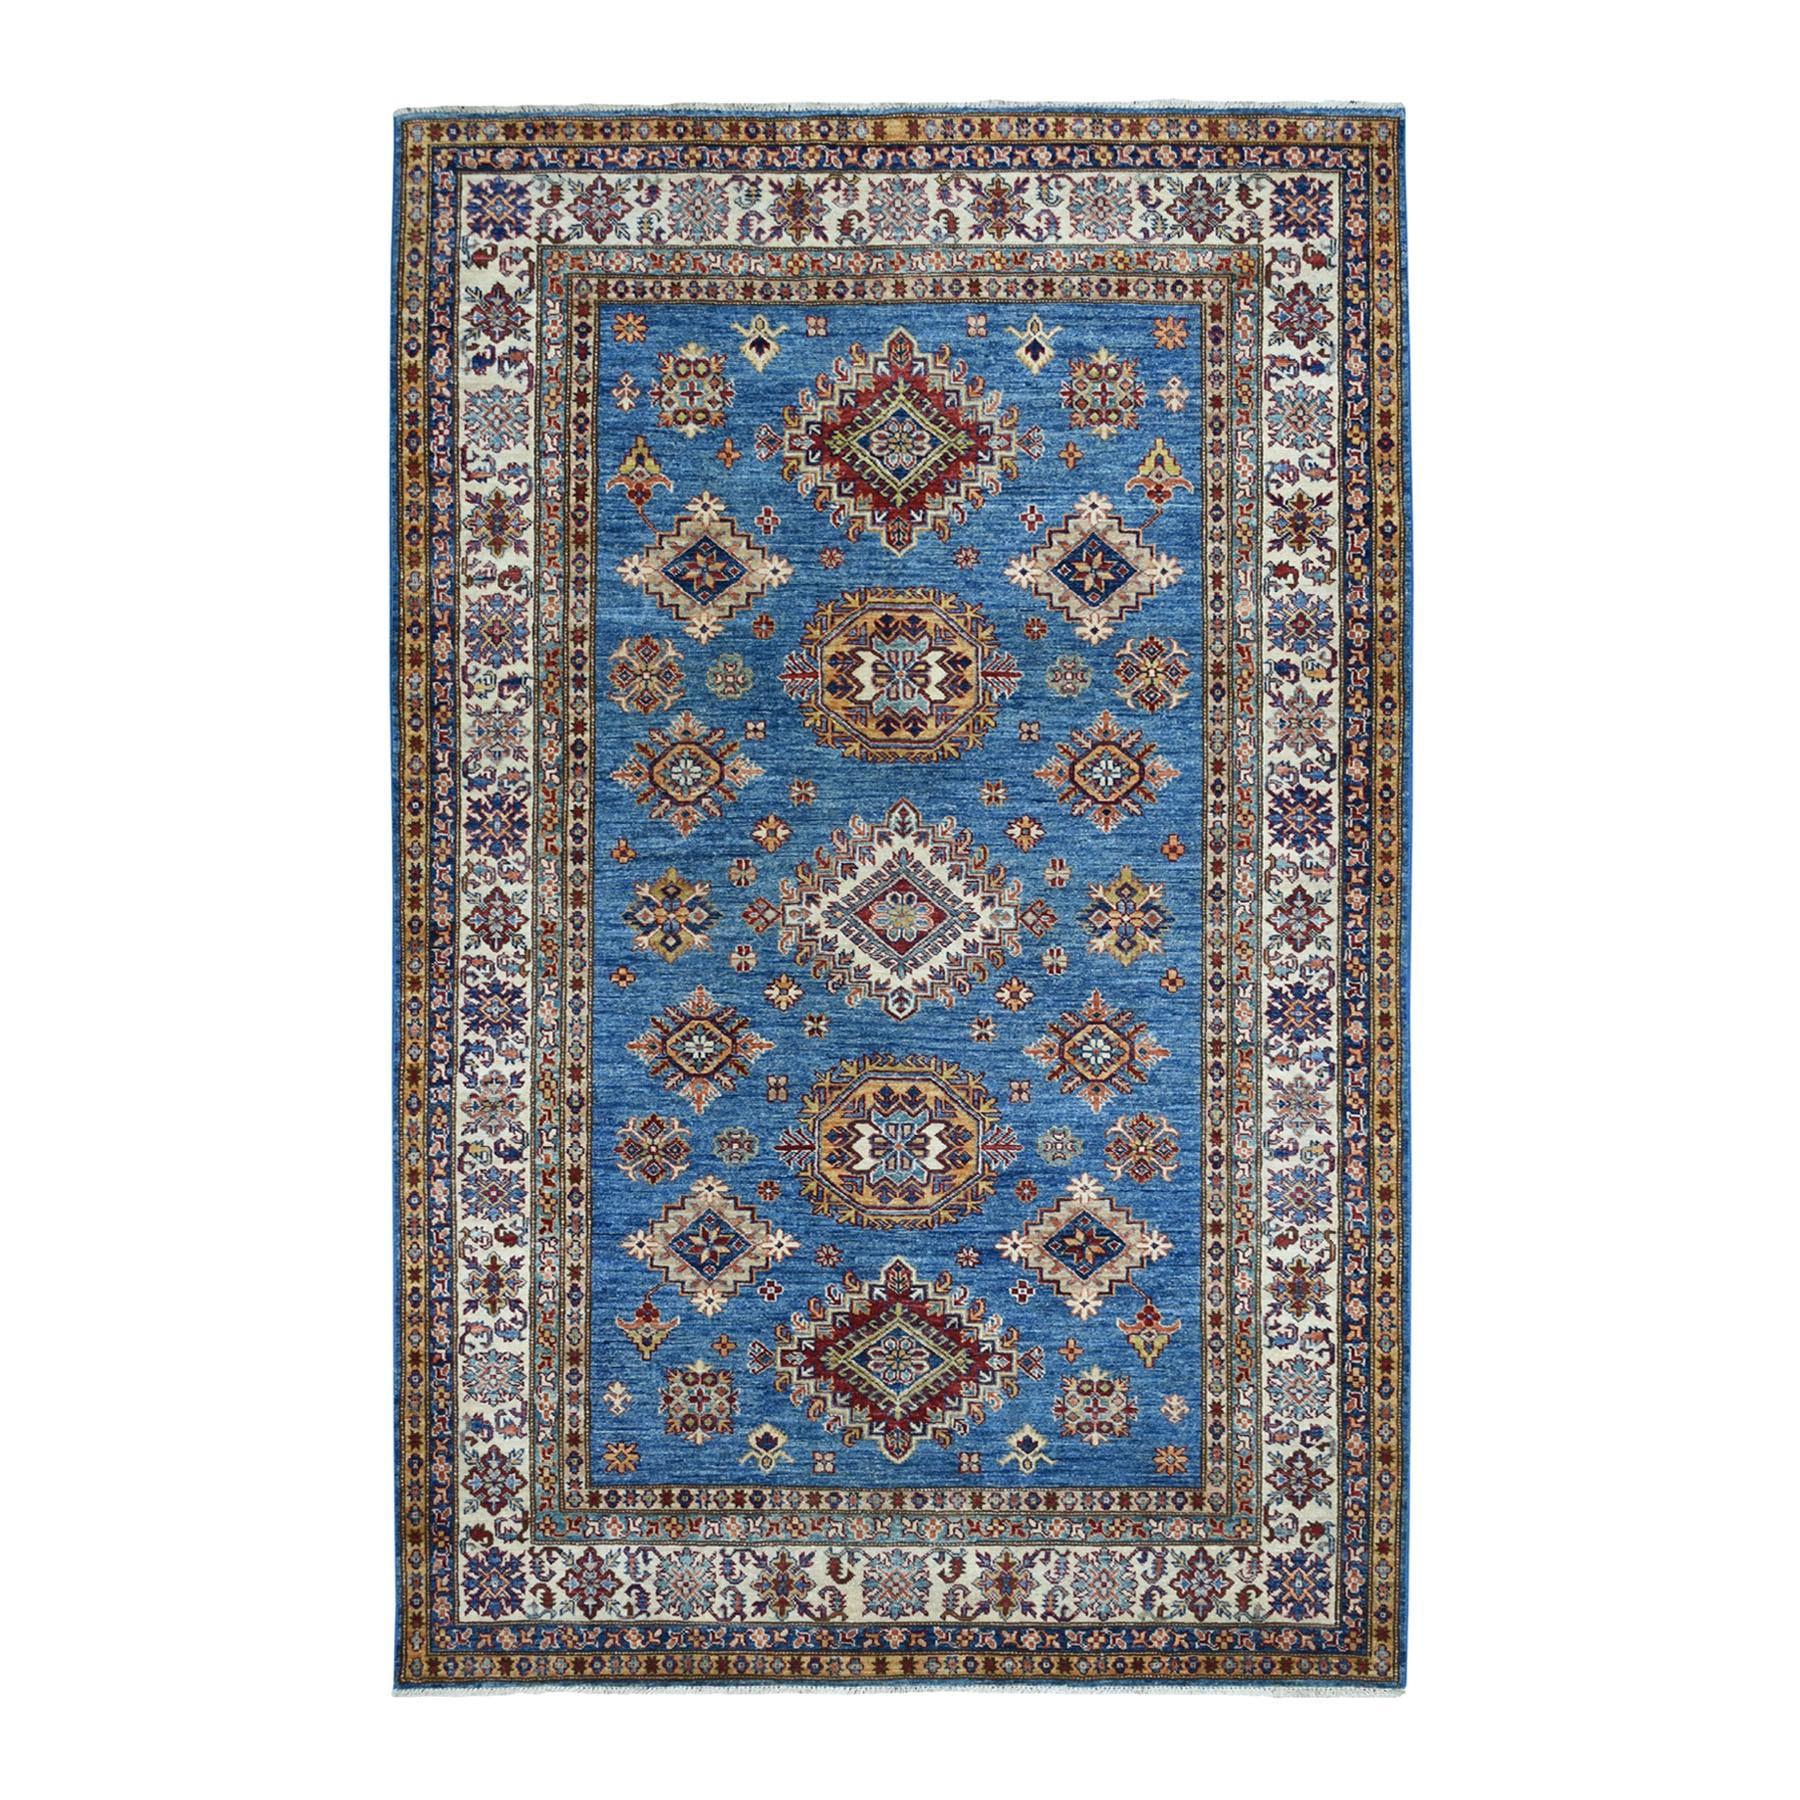 "5'8""X8'6"" Blue Super Kazak Geometric Design Pure Wool Hand-Knotted Oriental Rug moaeadca"